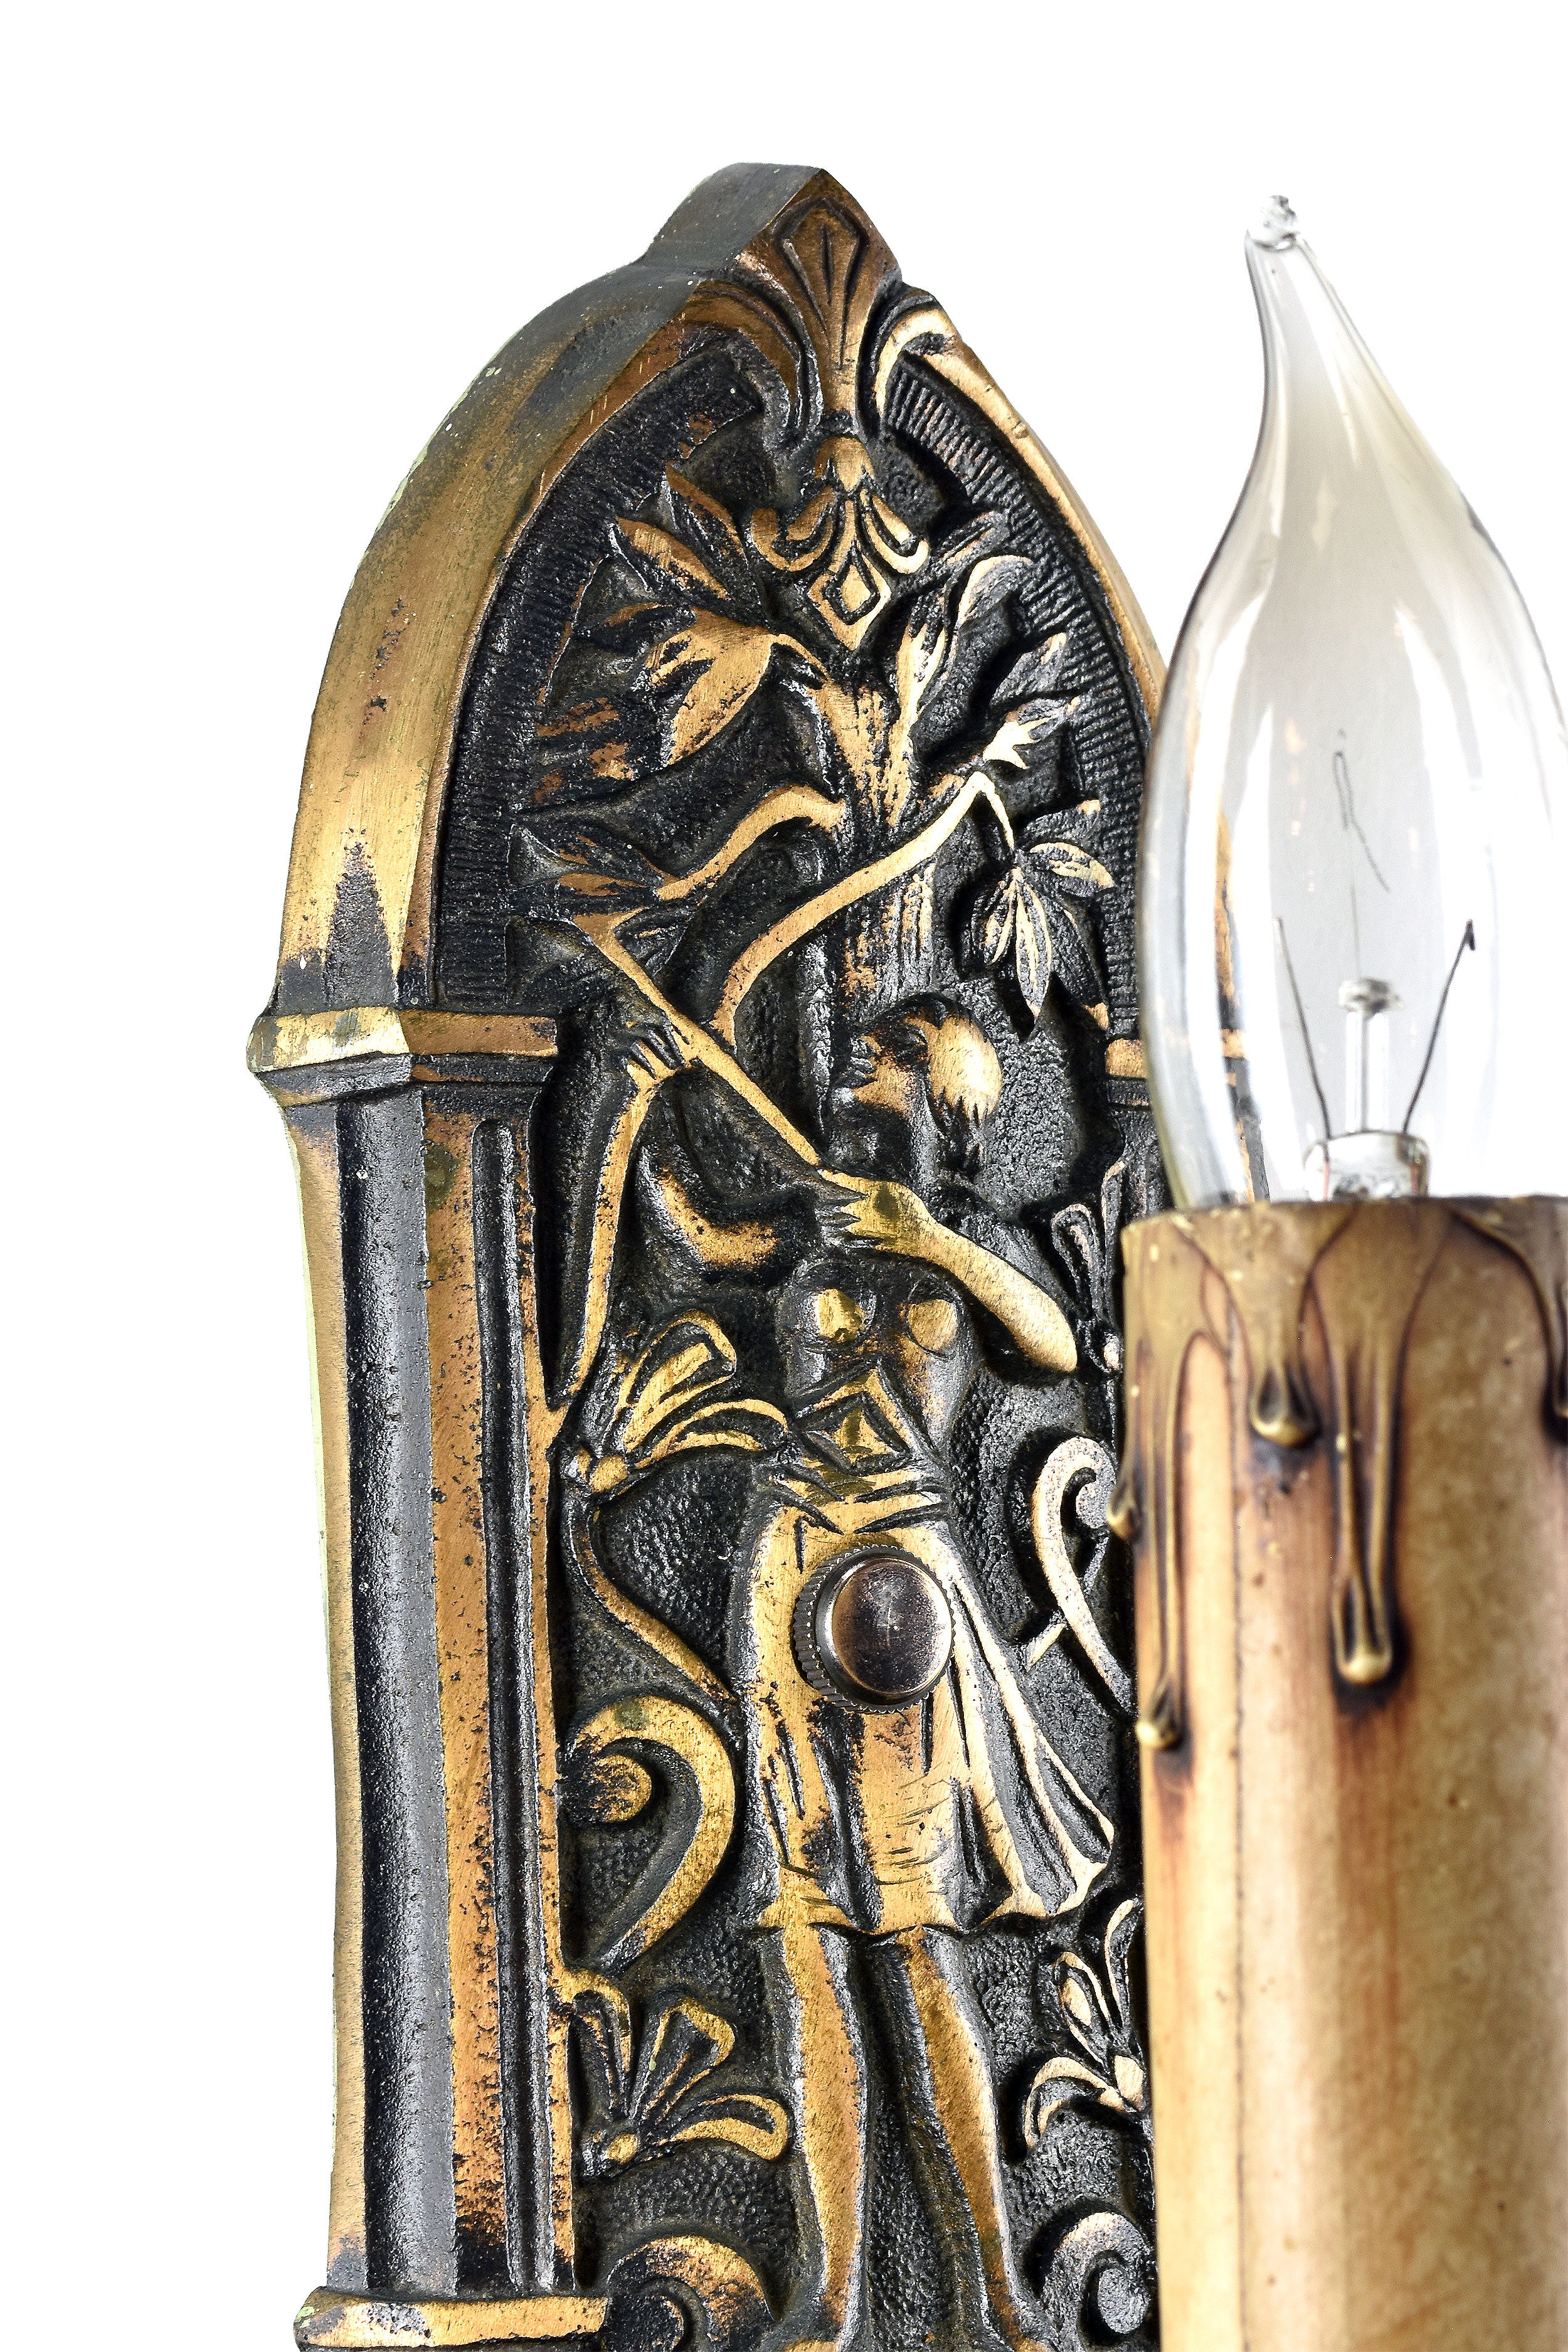 48426 single candle bronze archer sconce close.jpg